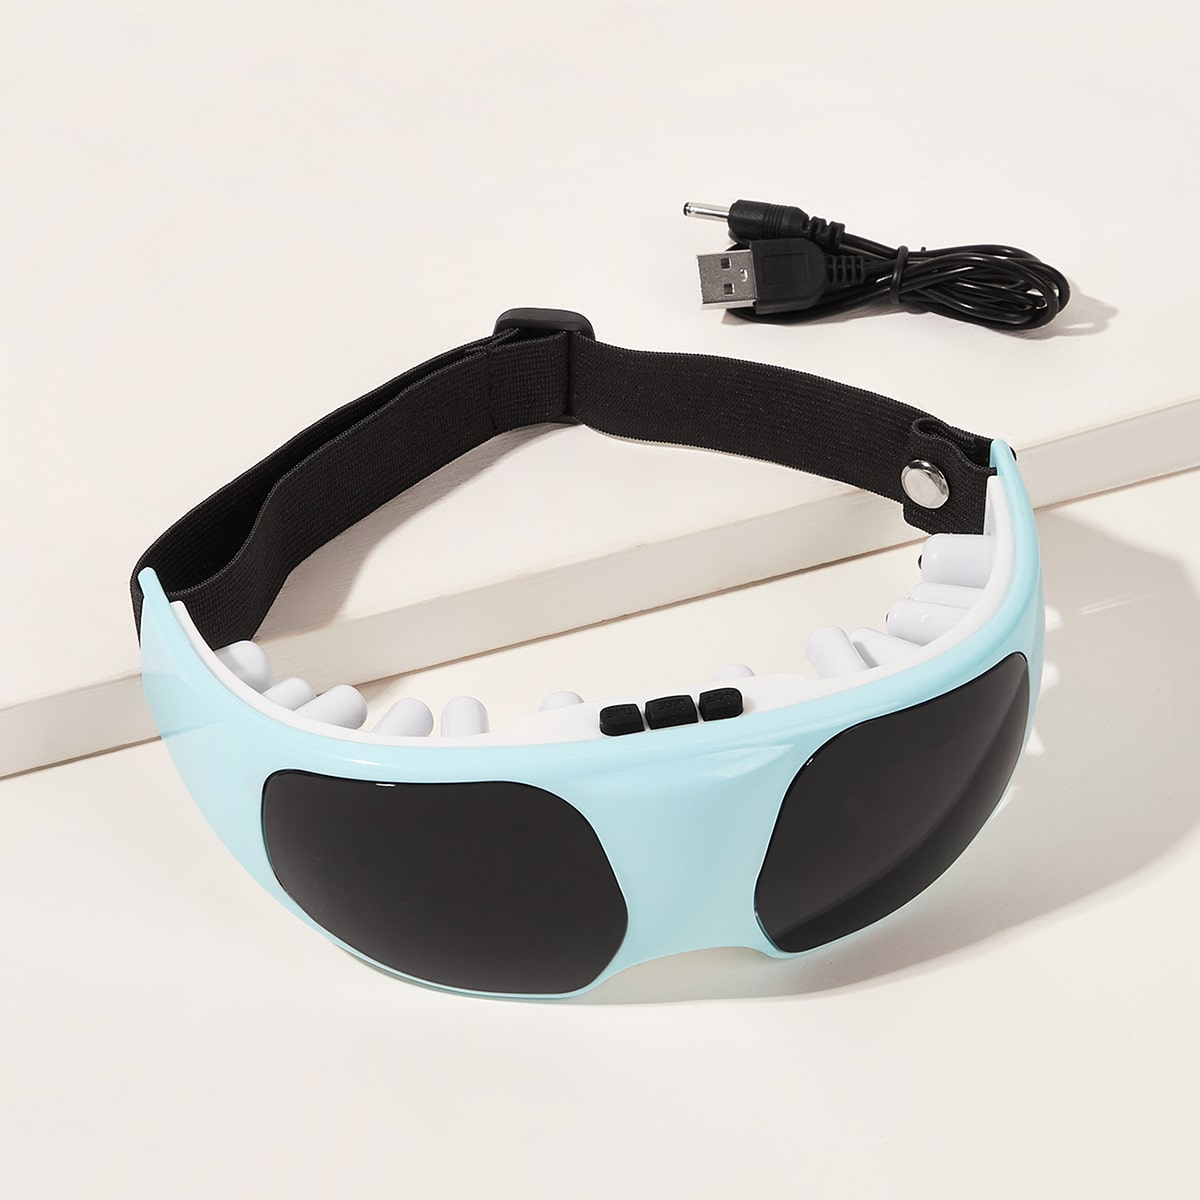 Multi-frequentie vibratie oogzorg massage-instrument